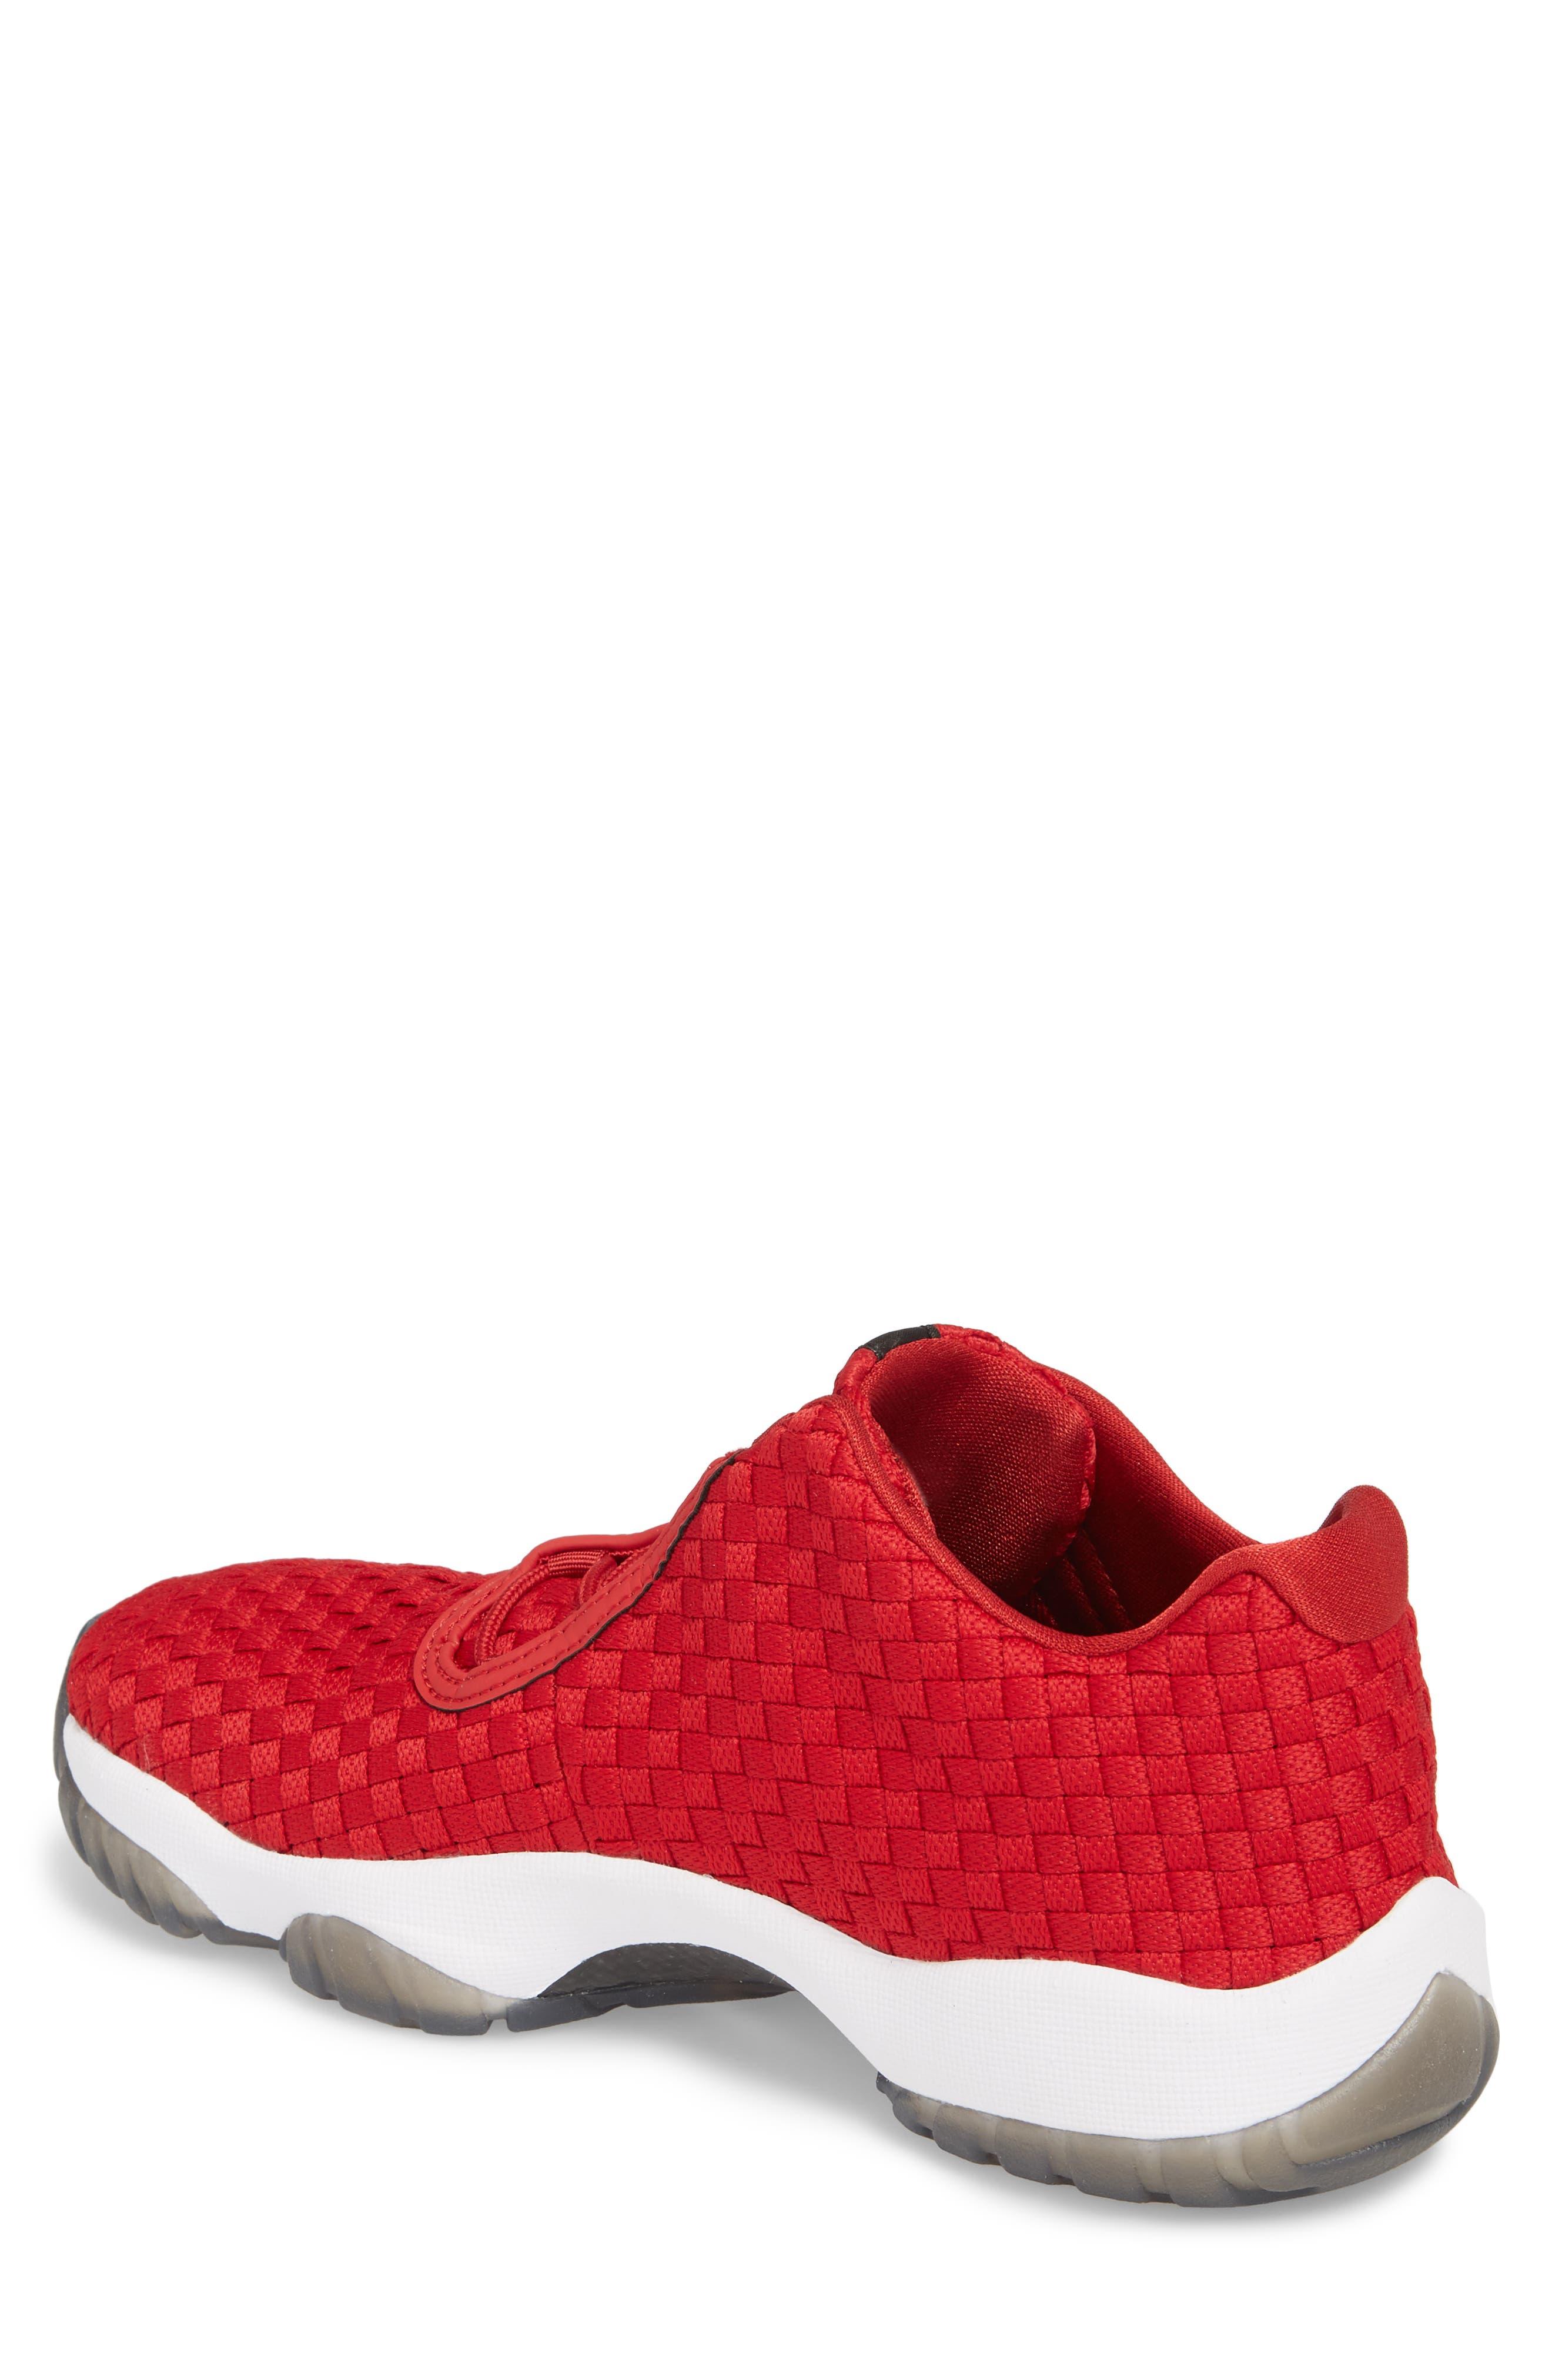 Air Jordan Future Woven Sneaker,                             Alternate thumbnail 2, color,                             Gym Red/ White/ Black